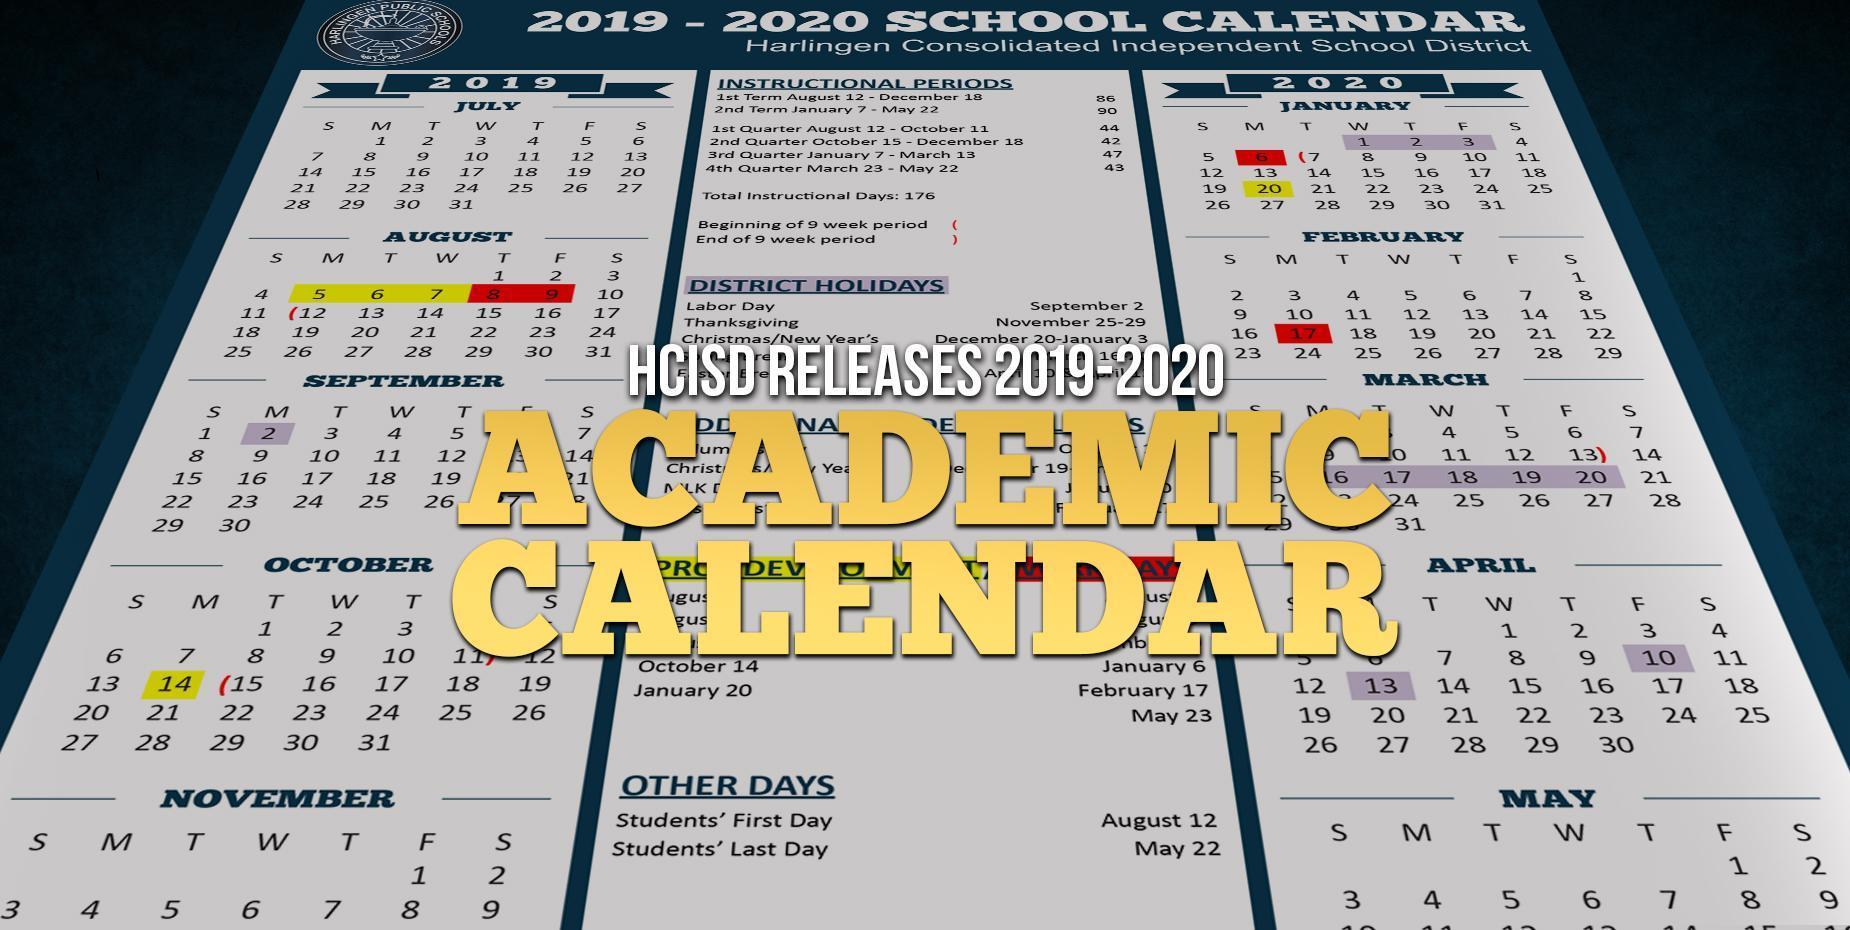 Ecu Academic Calendar 2020 Harlingen Consolidated Independent School District